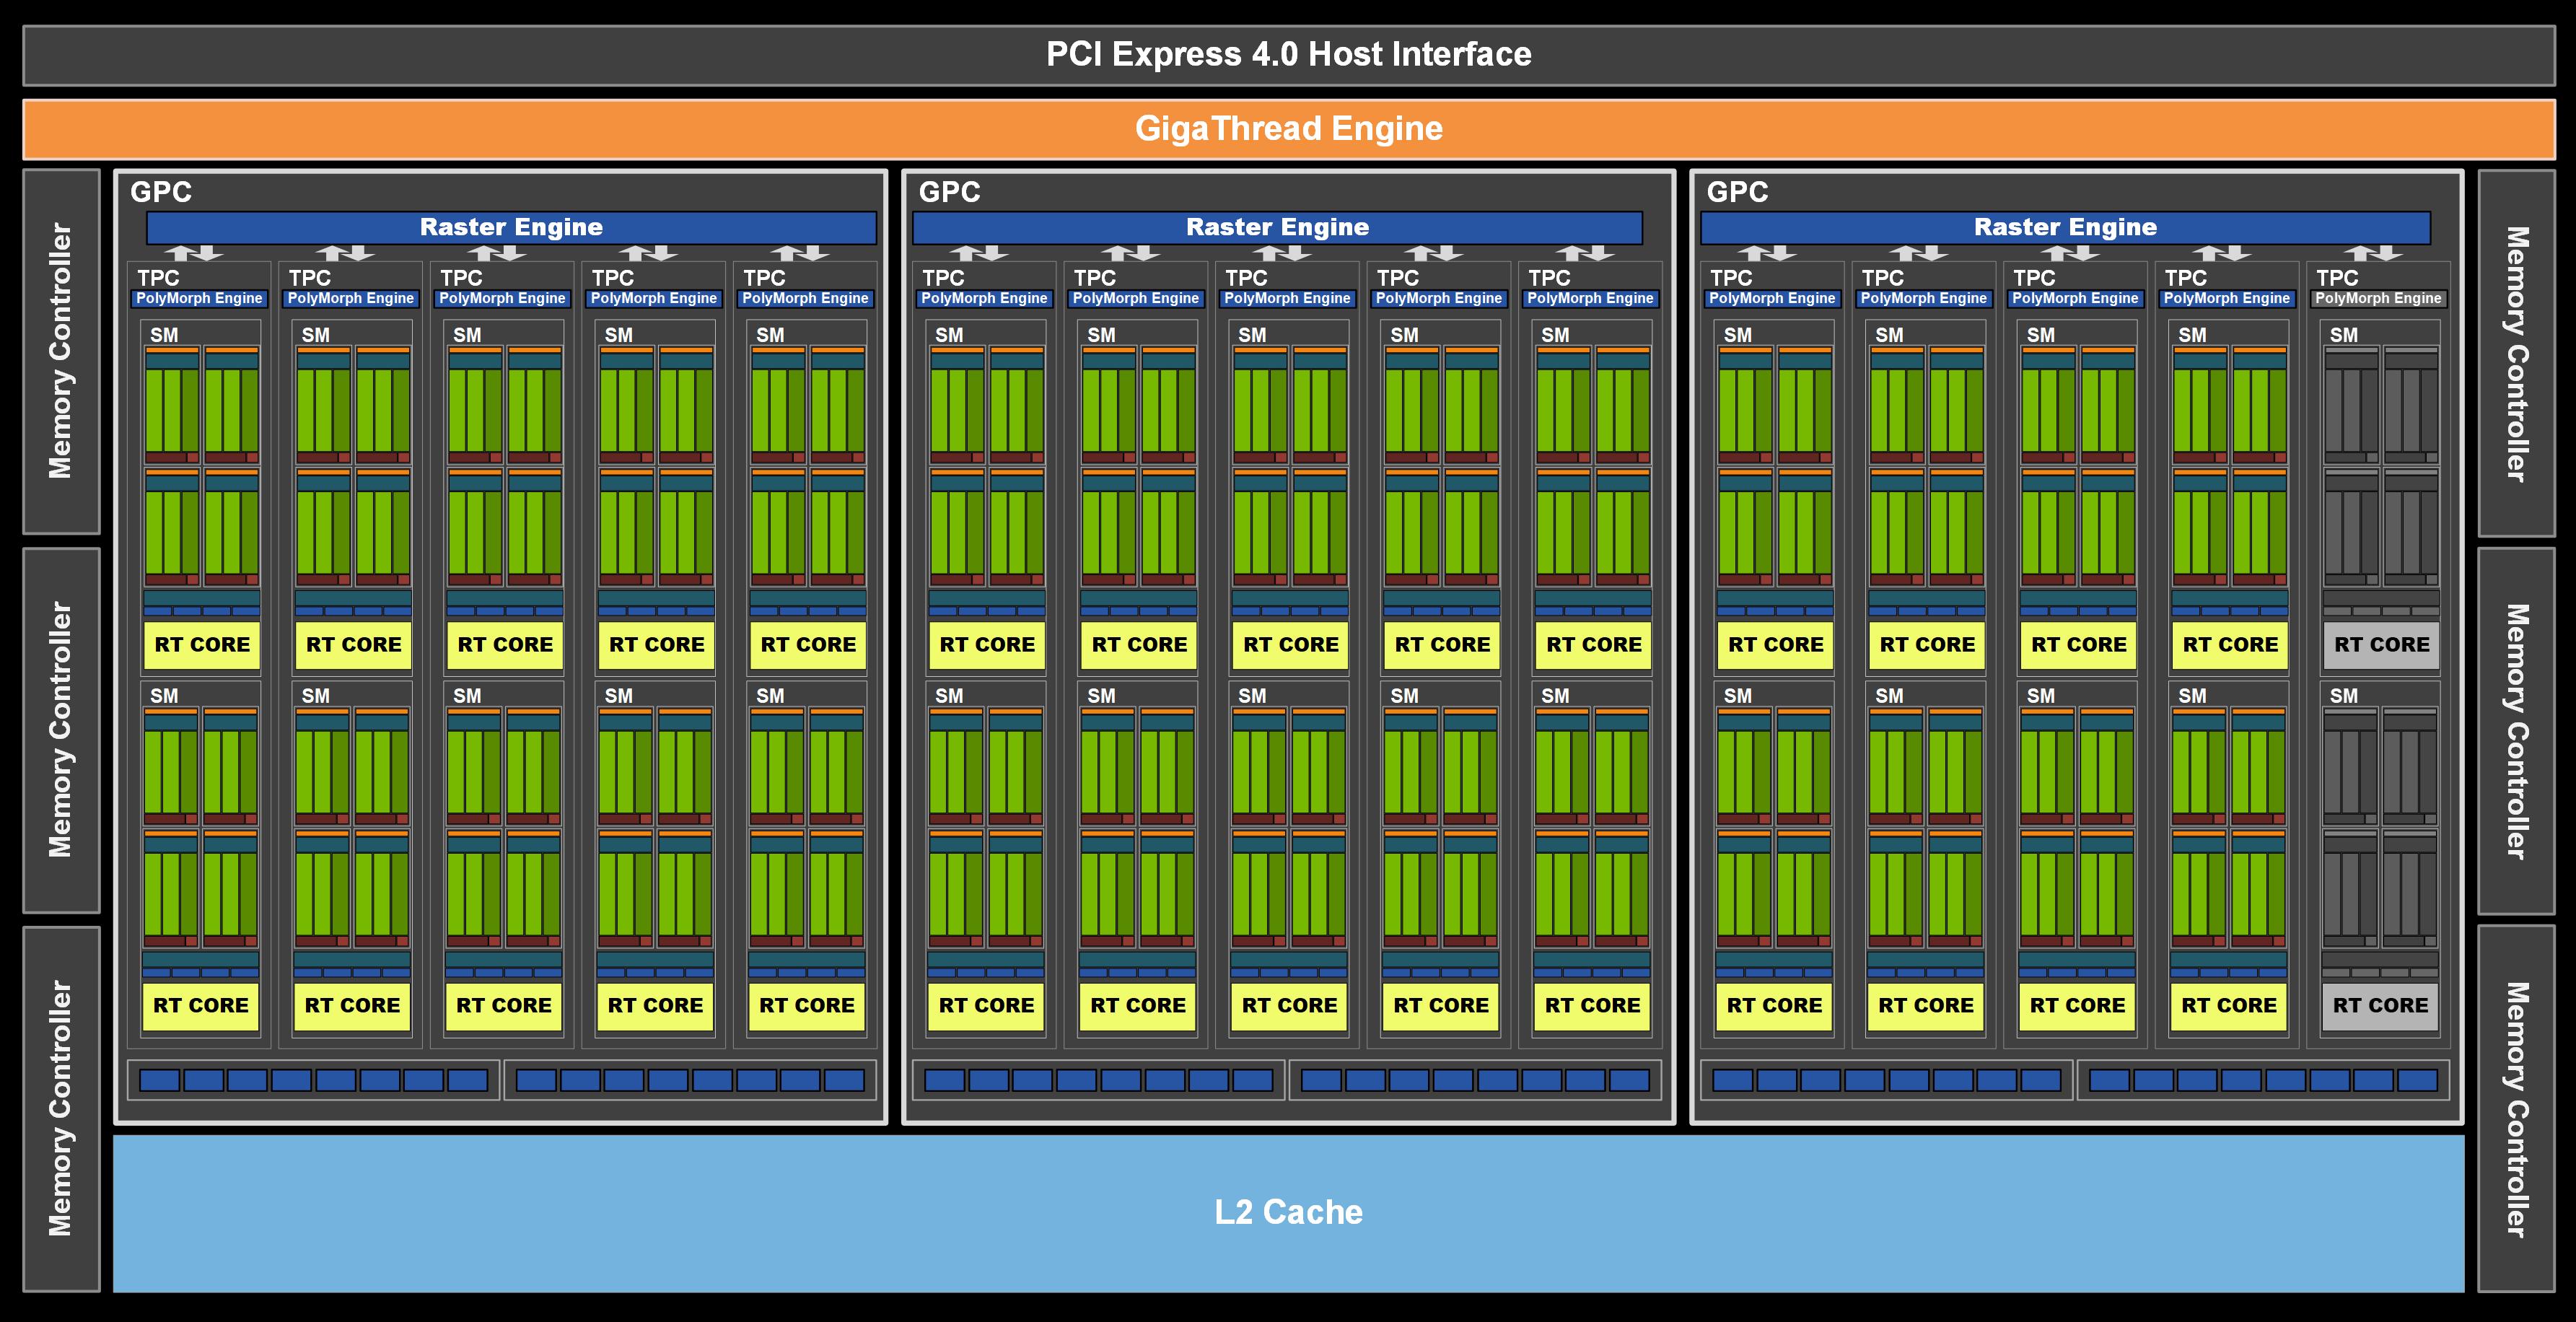 NVIDIA GeForce RTX 3060 GA106-300 Chip Diagram